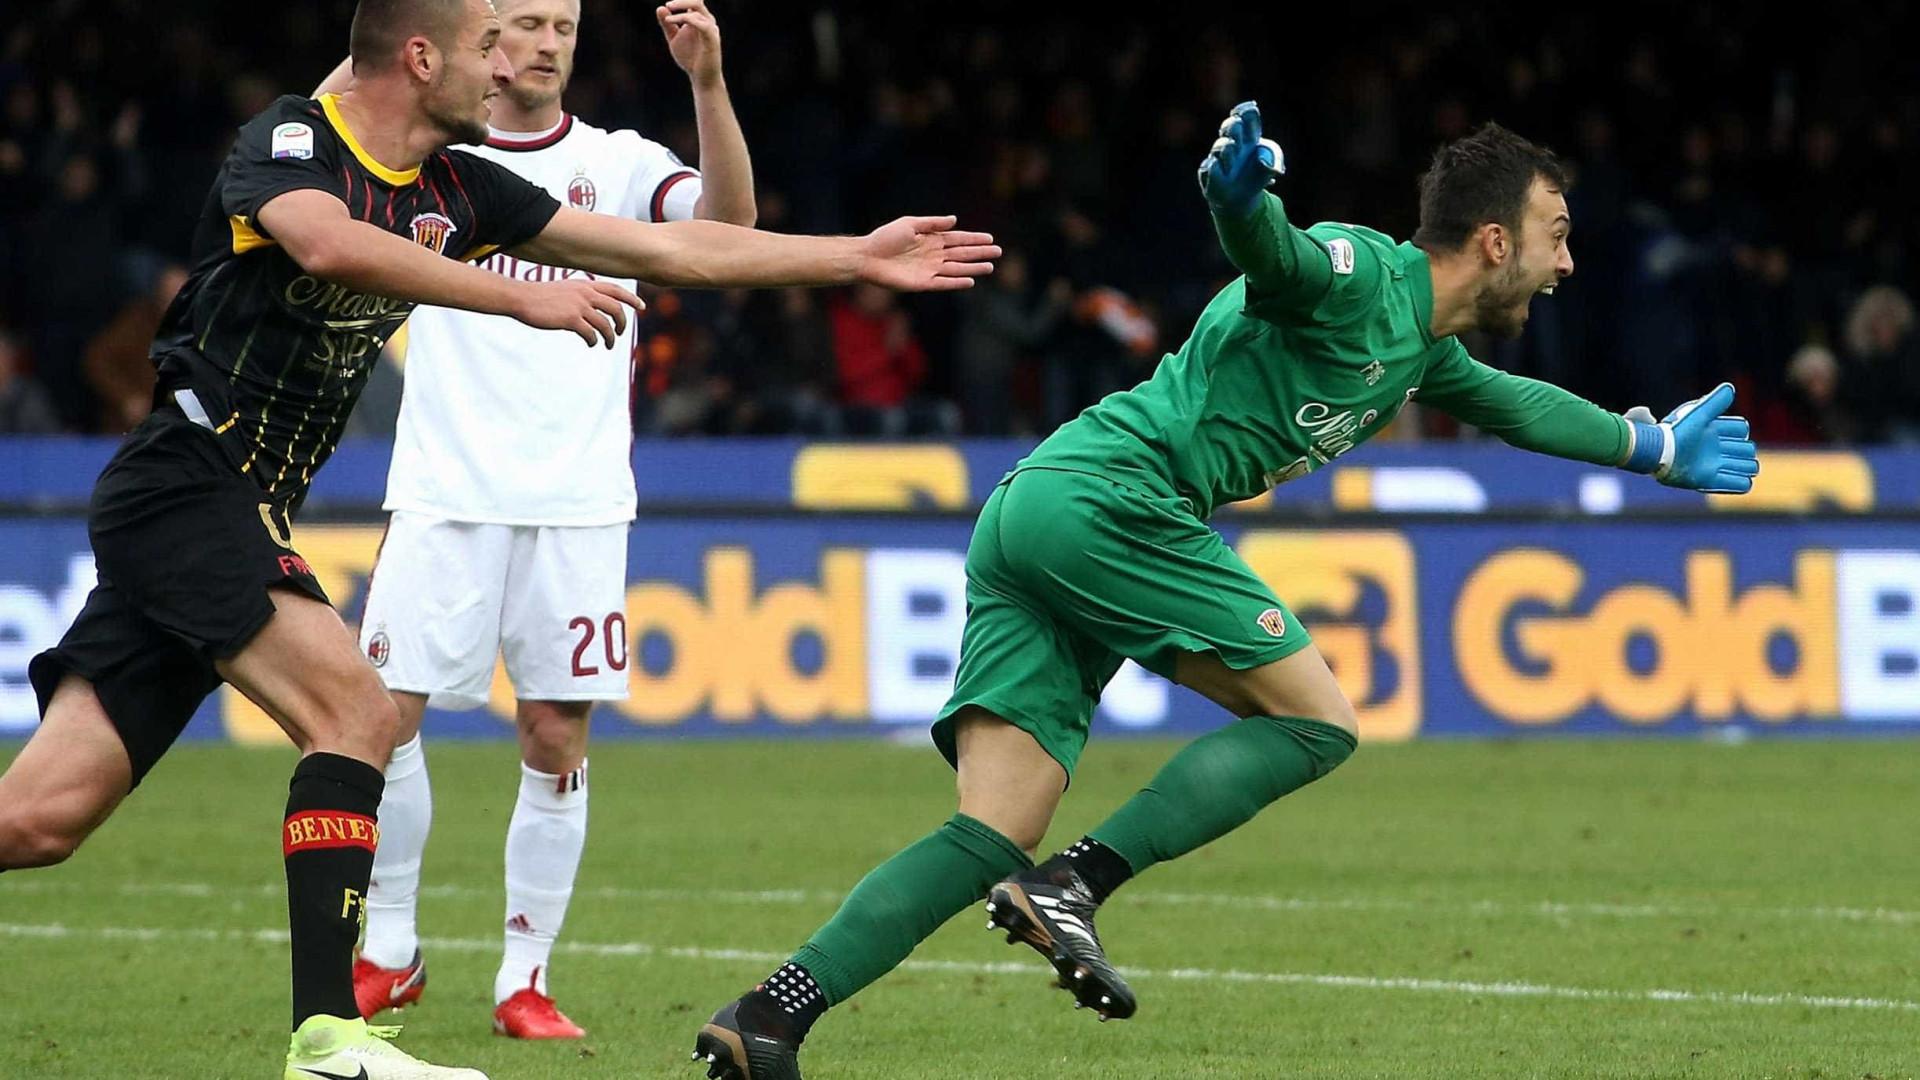 Guarda-redes do Benevento, autor de um golo, deixa 'recado' a Ronaldo